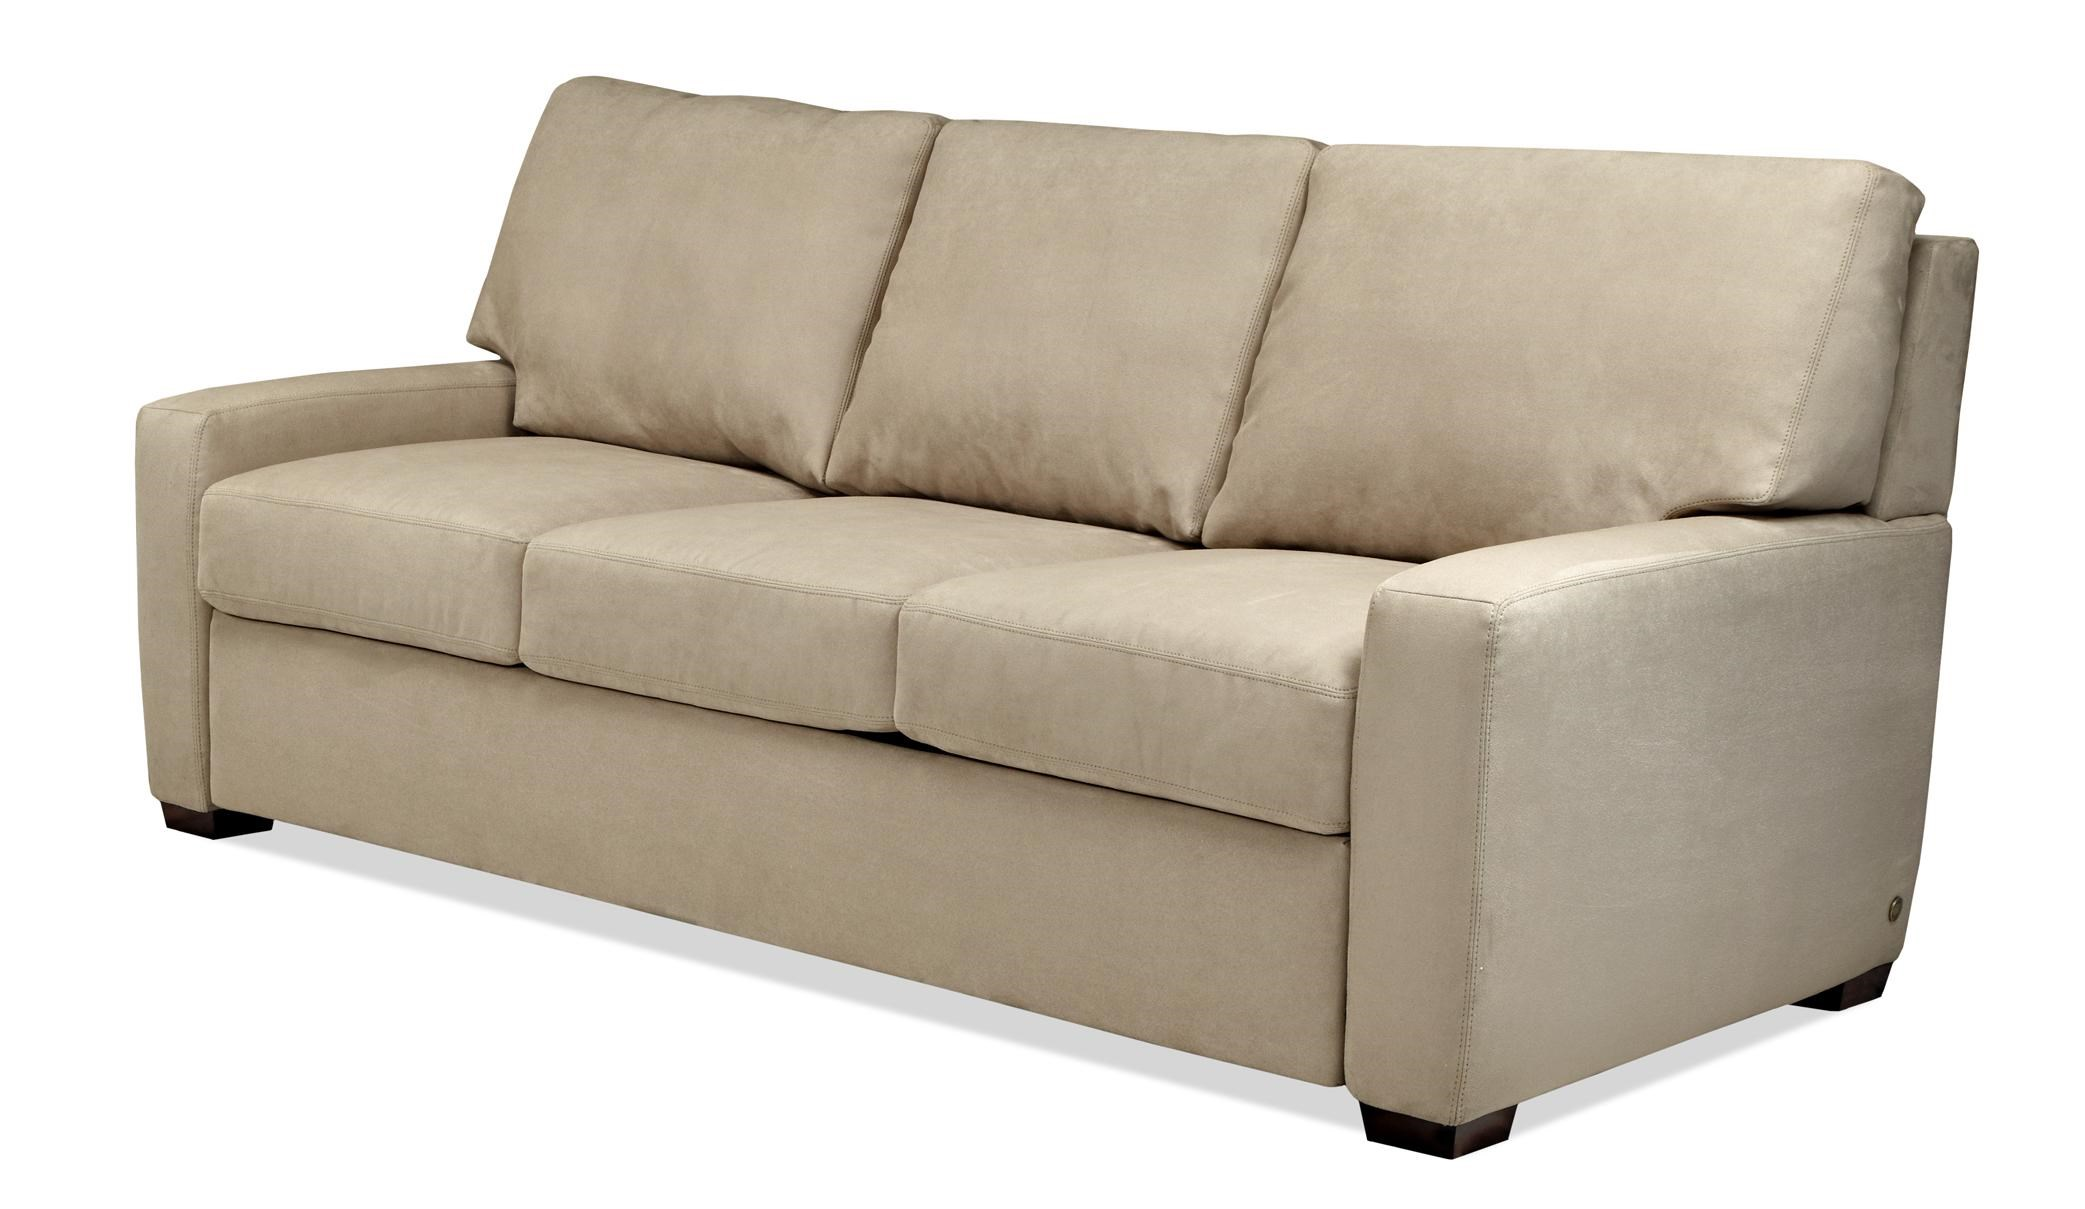 American Leather Comfort Sleeper   Cassidy Track Arm Queen Plus Sofa  Sleeper   Becker Furniture World   Sofa Sleeper